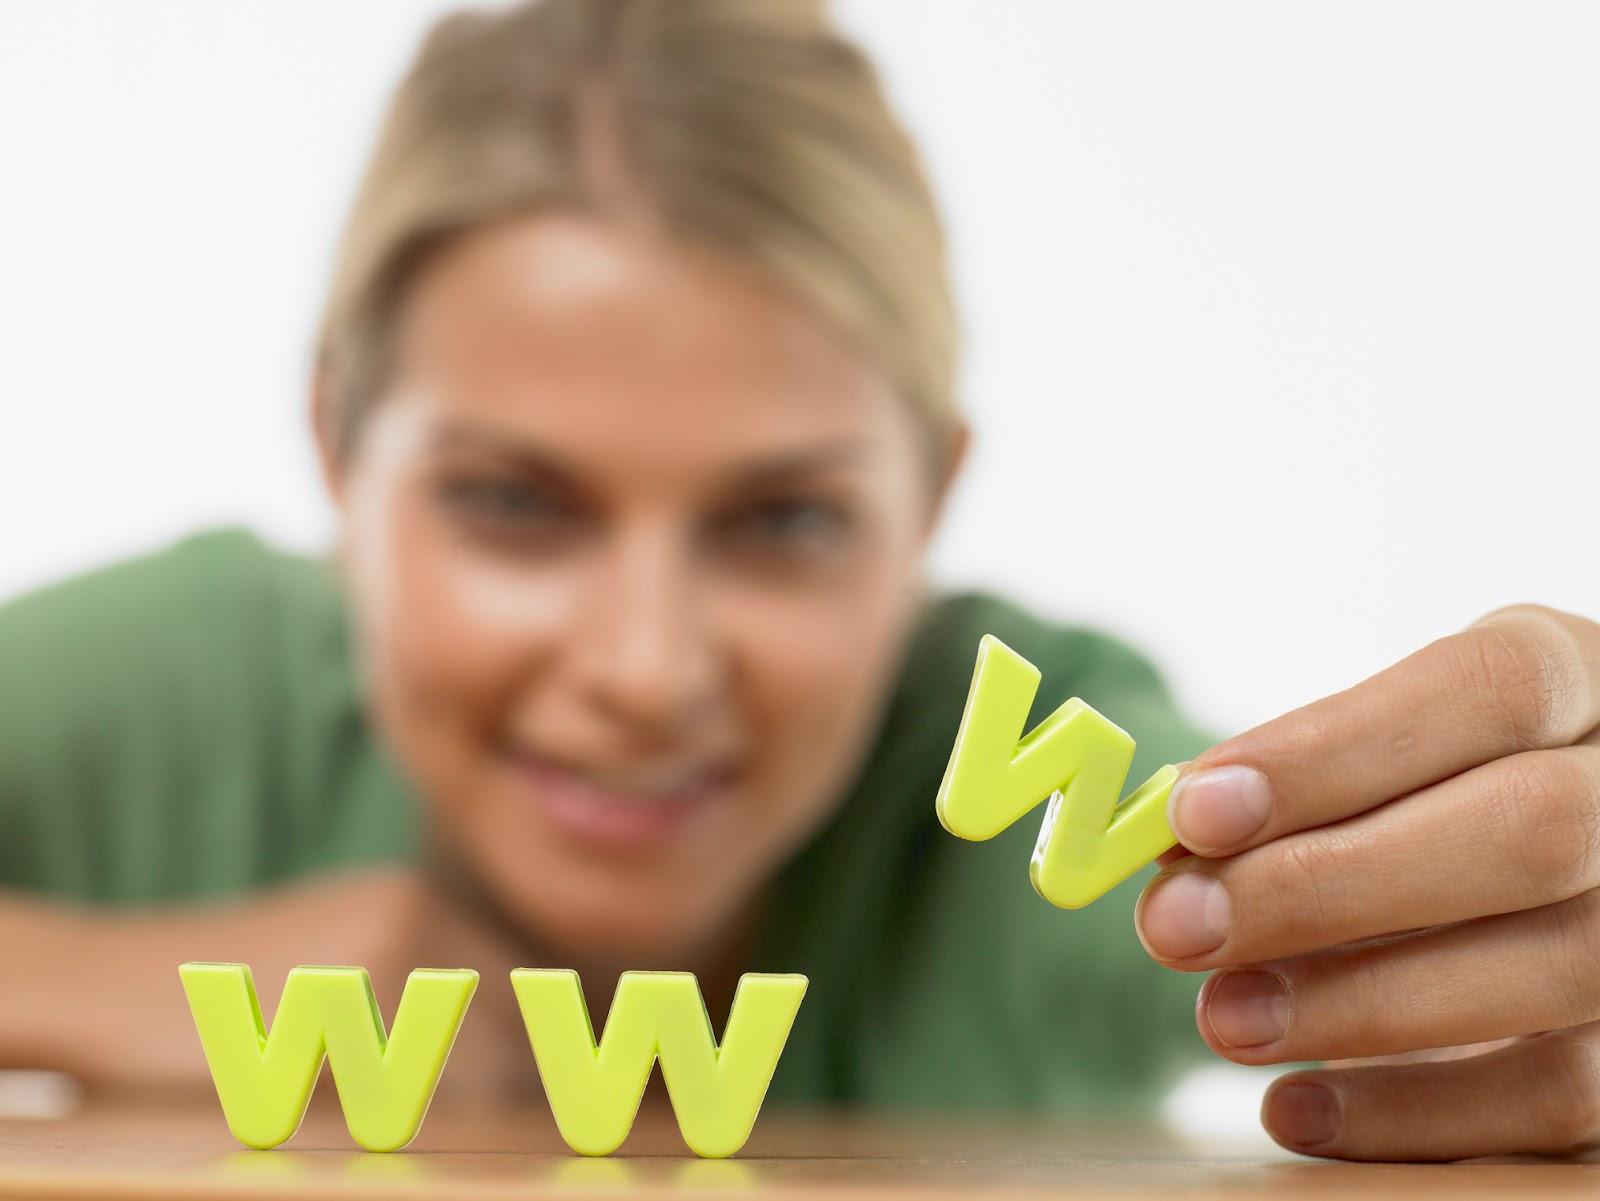 MujeresInternet